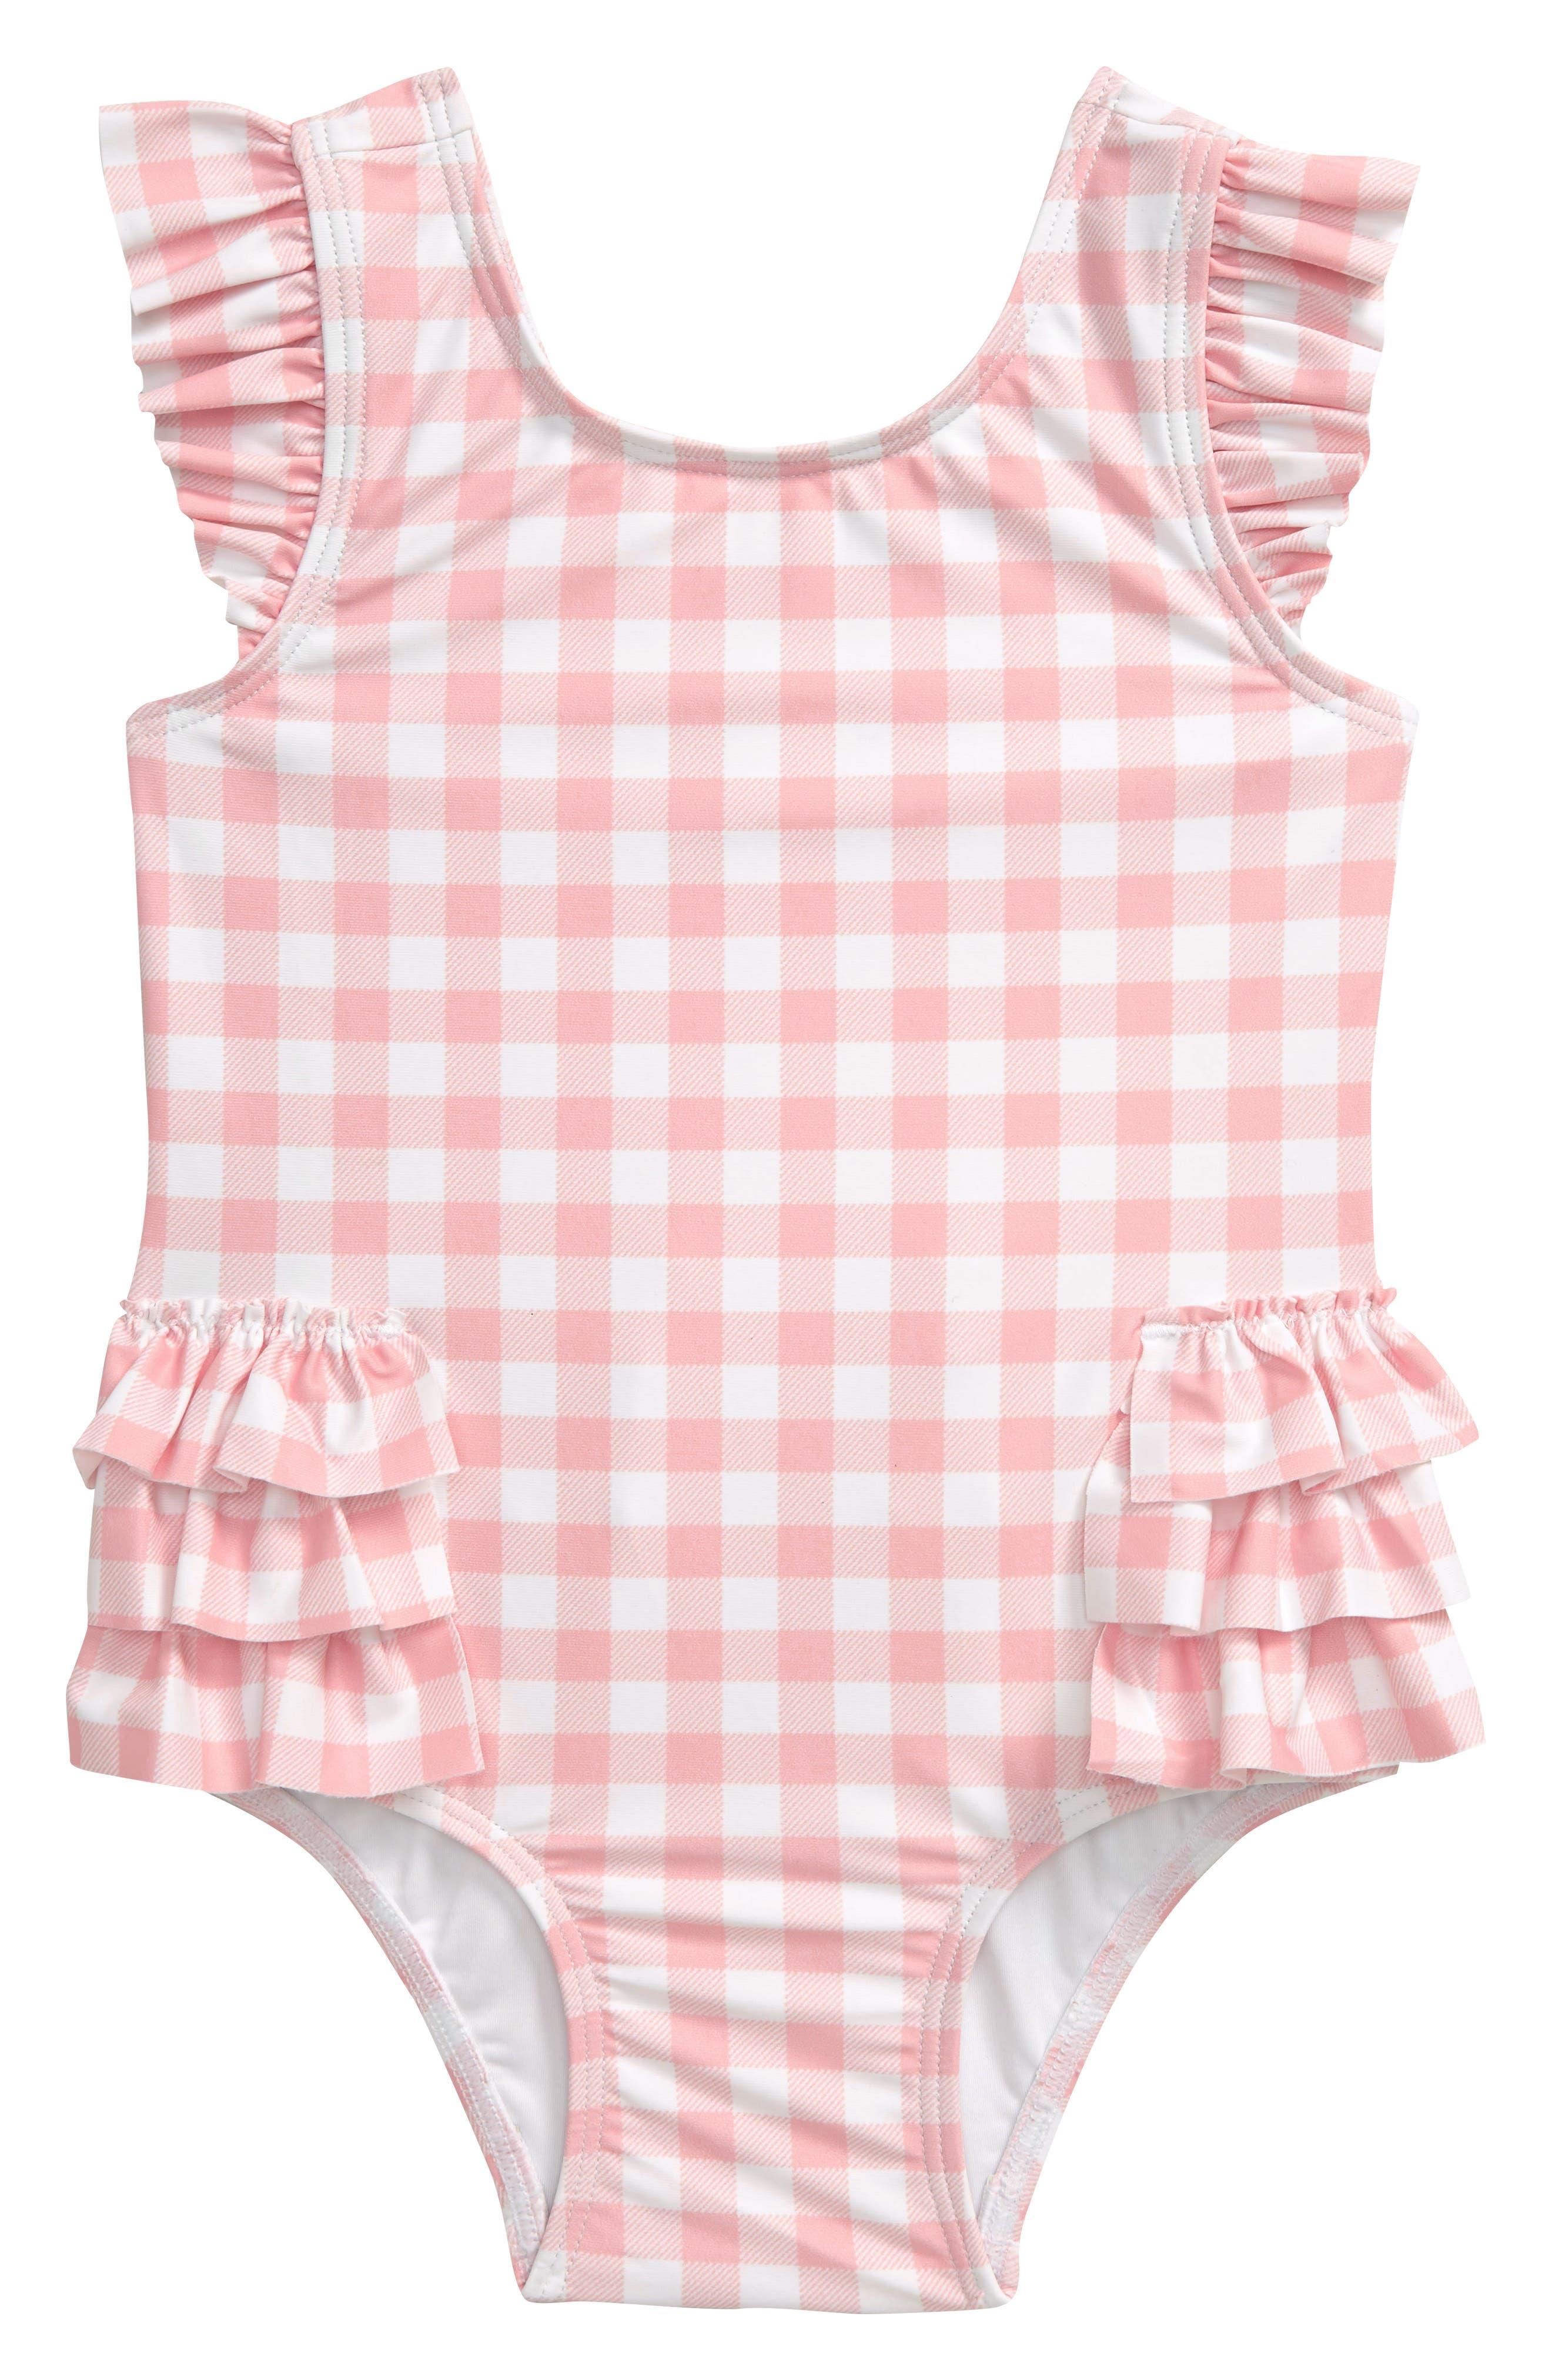 Girls Top Leggings Polka Spot Ditsy Flower Summer Outfit Newborn Baby 6 Months